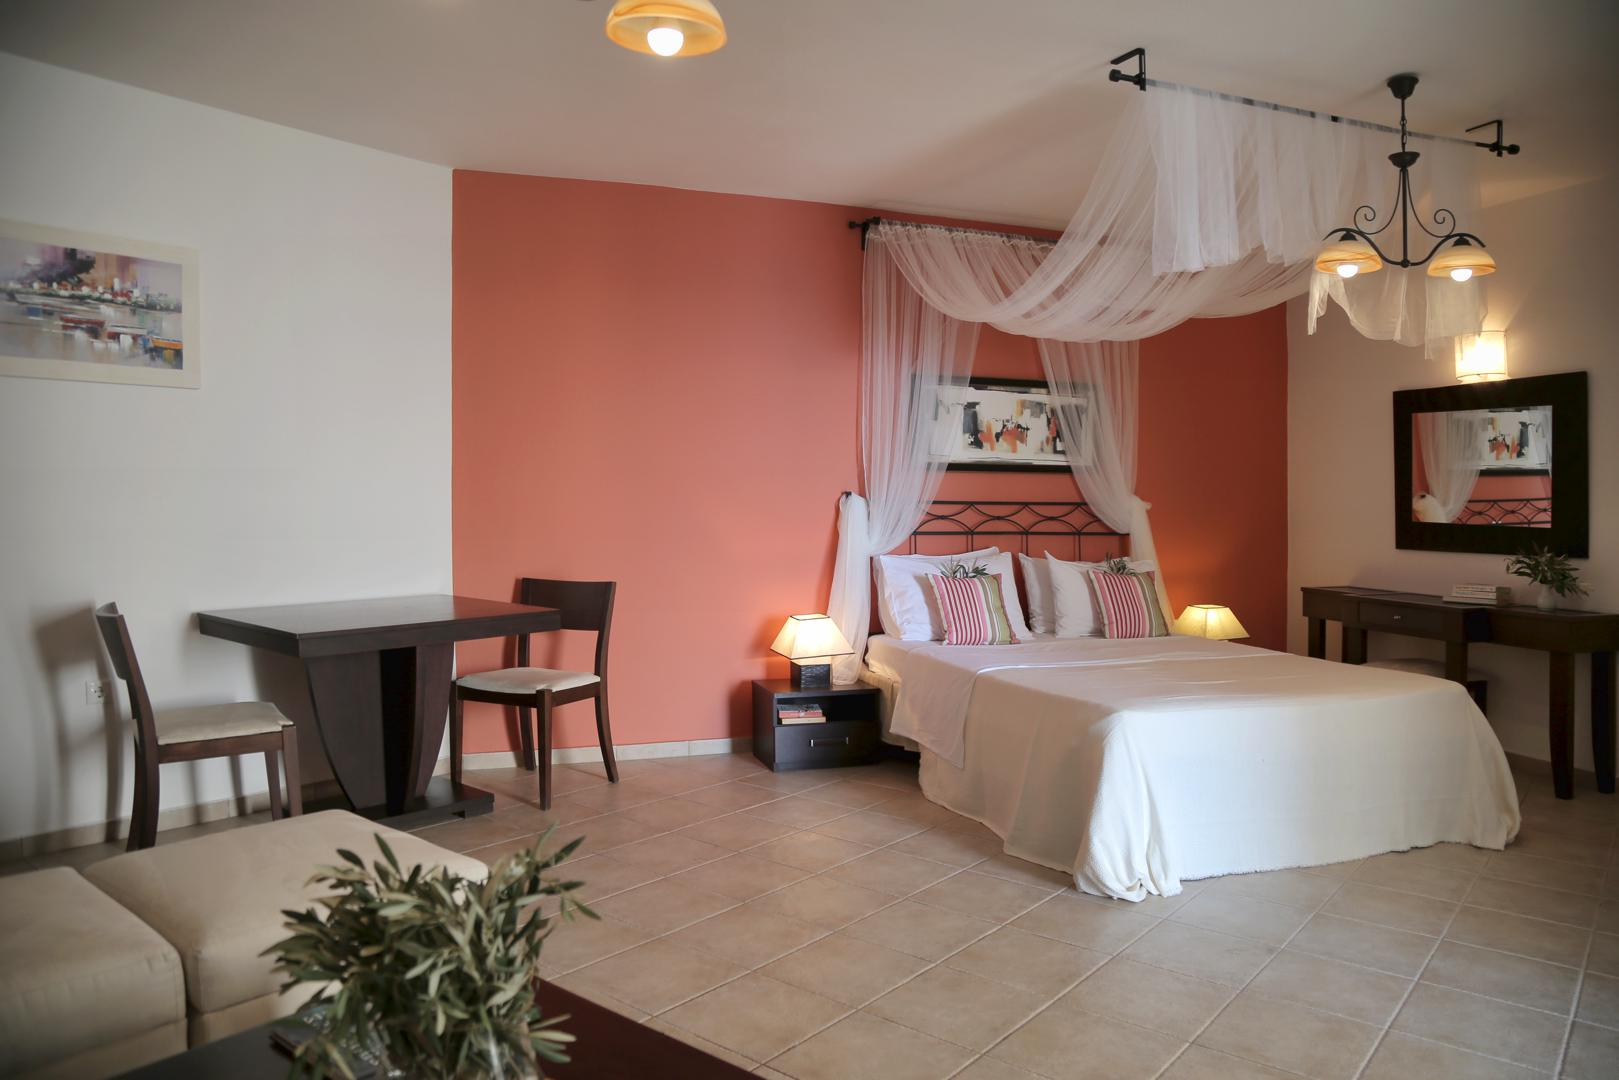 Yalis Hotel - Standard Room Bed